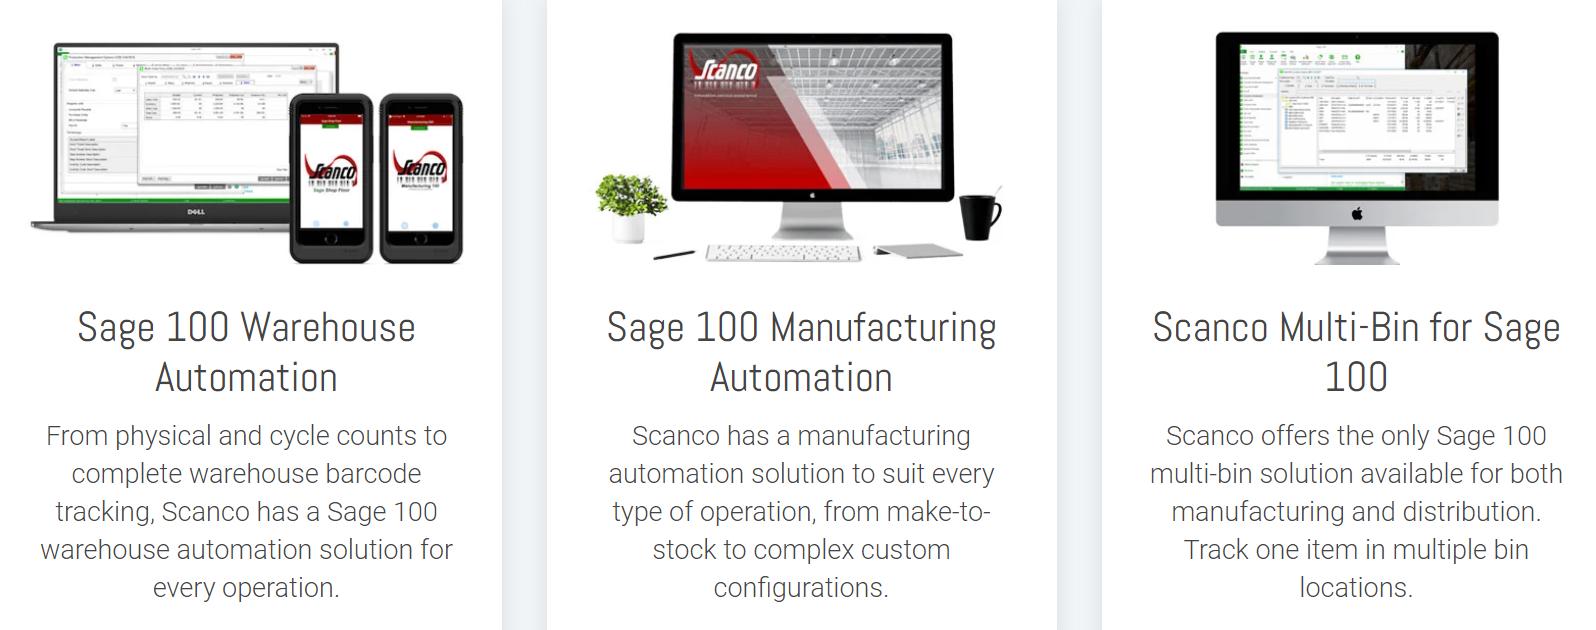 Scanco - Sage 100